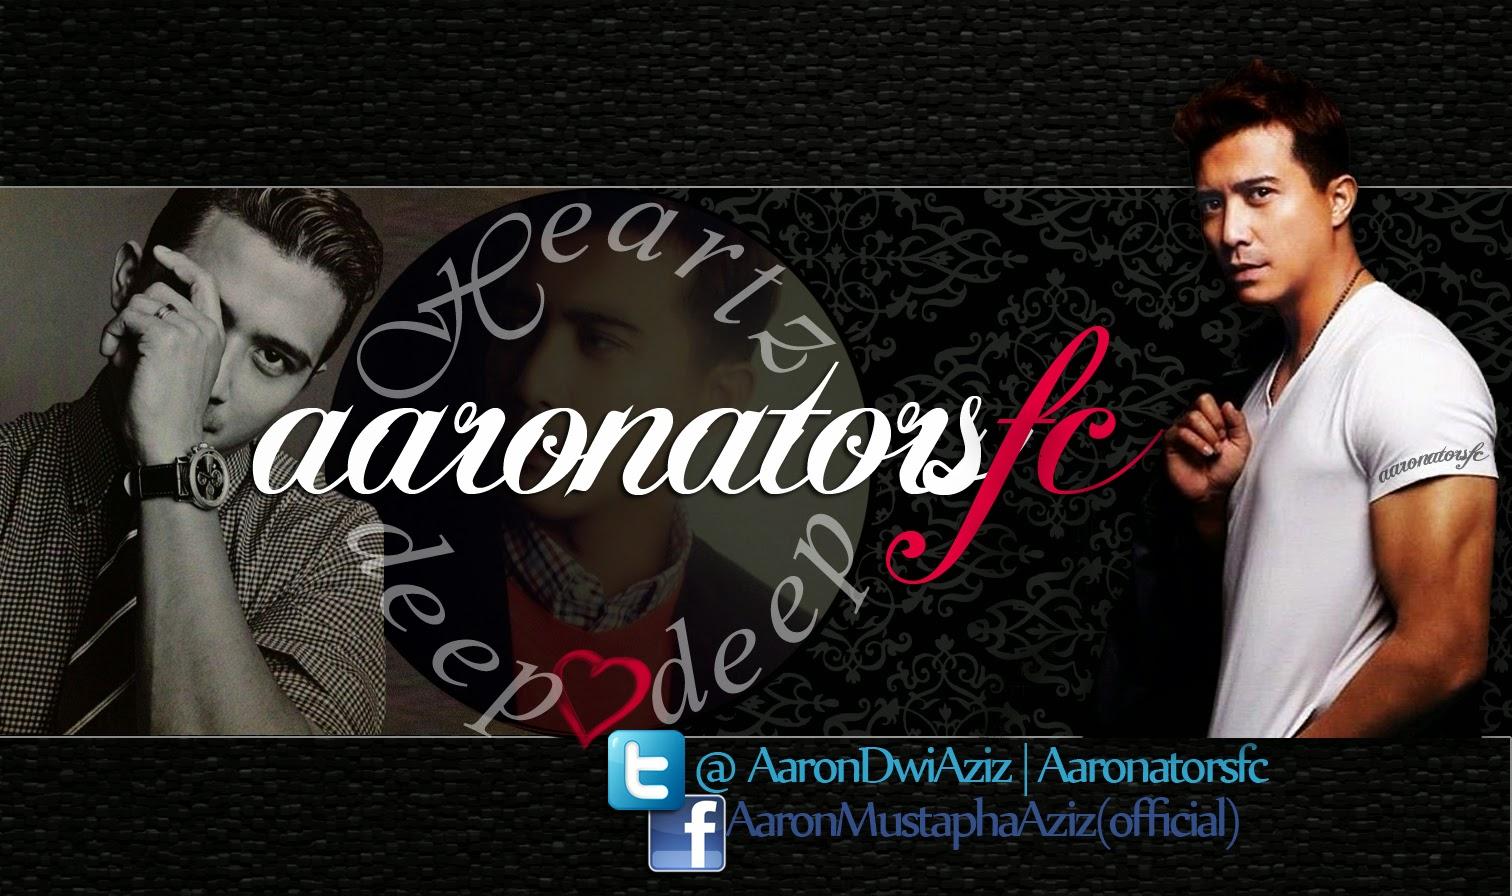 Aaronators FC